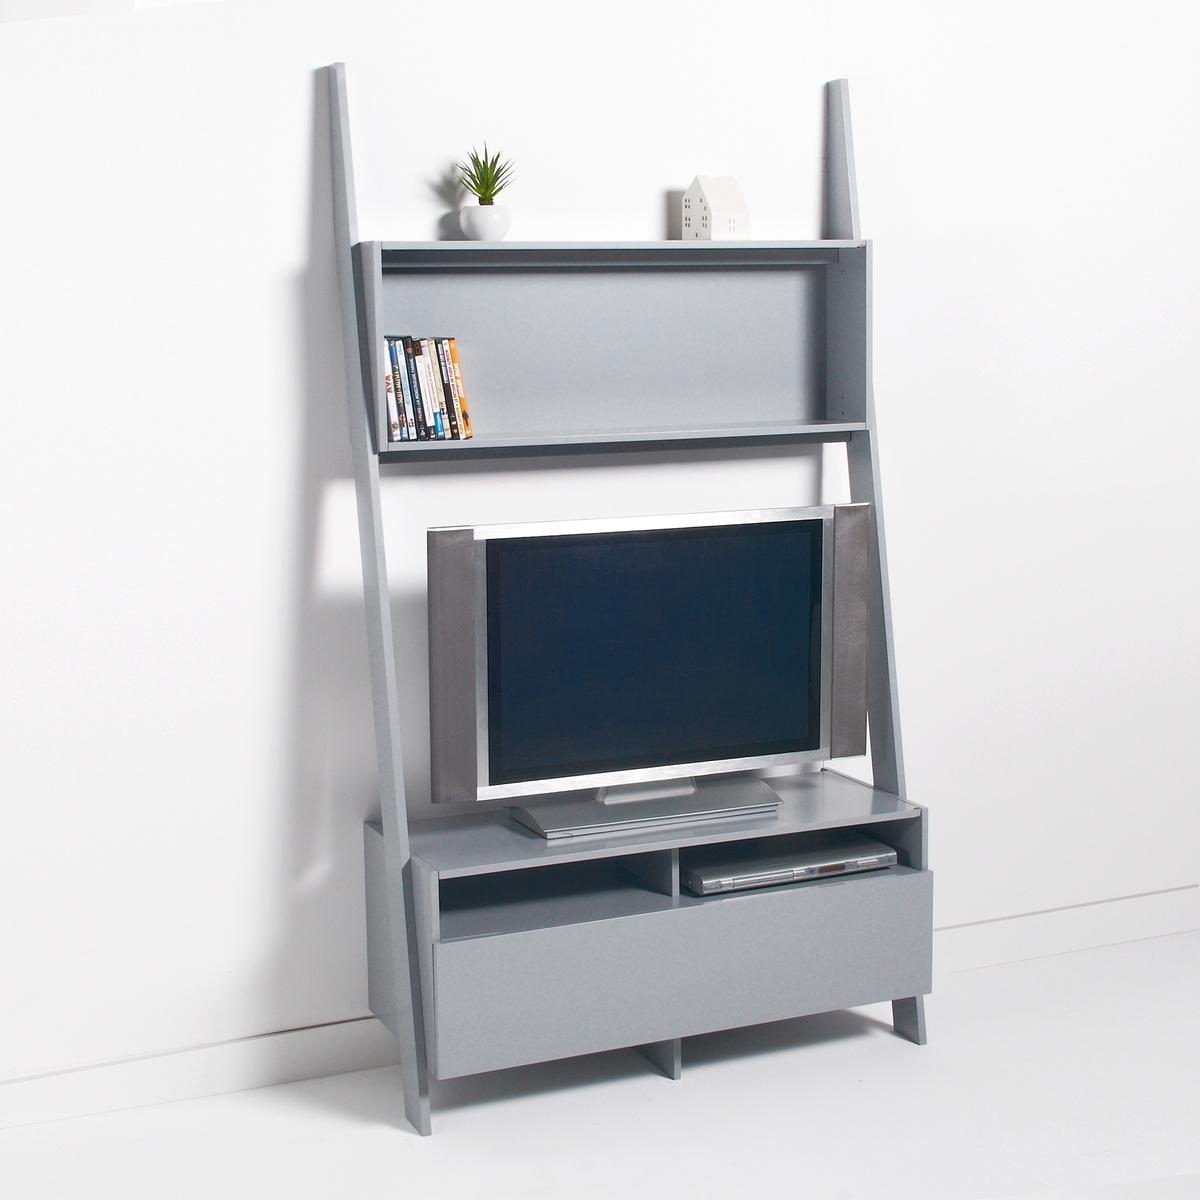 Тумба-лестница для телевизора, Domeno